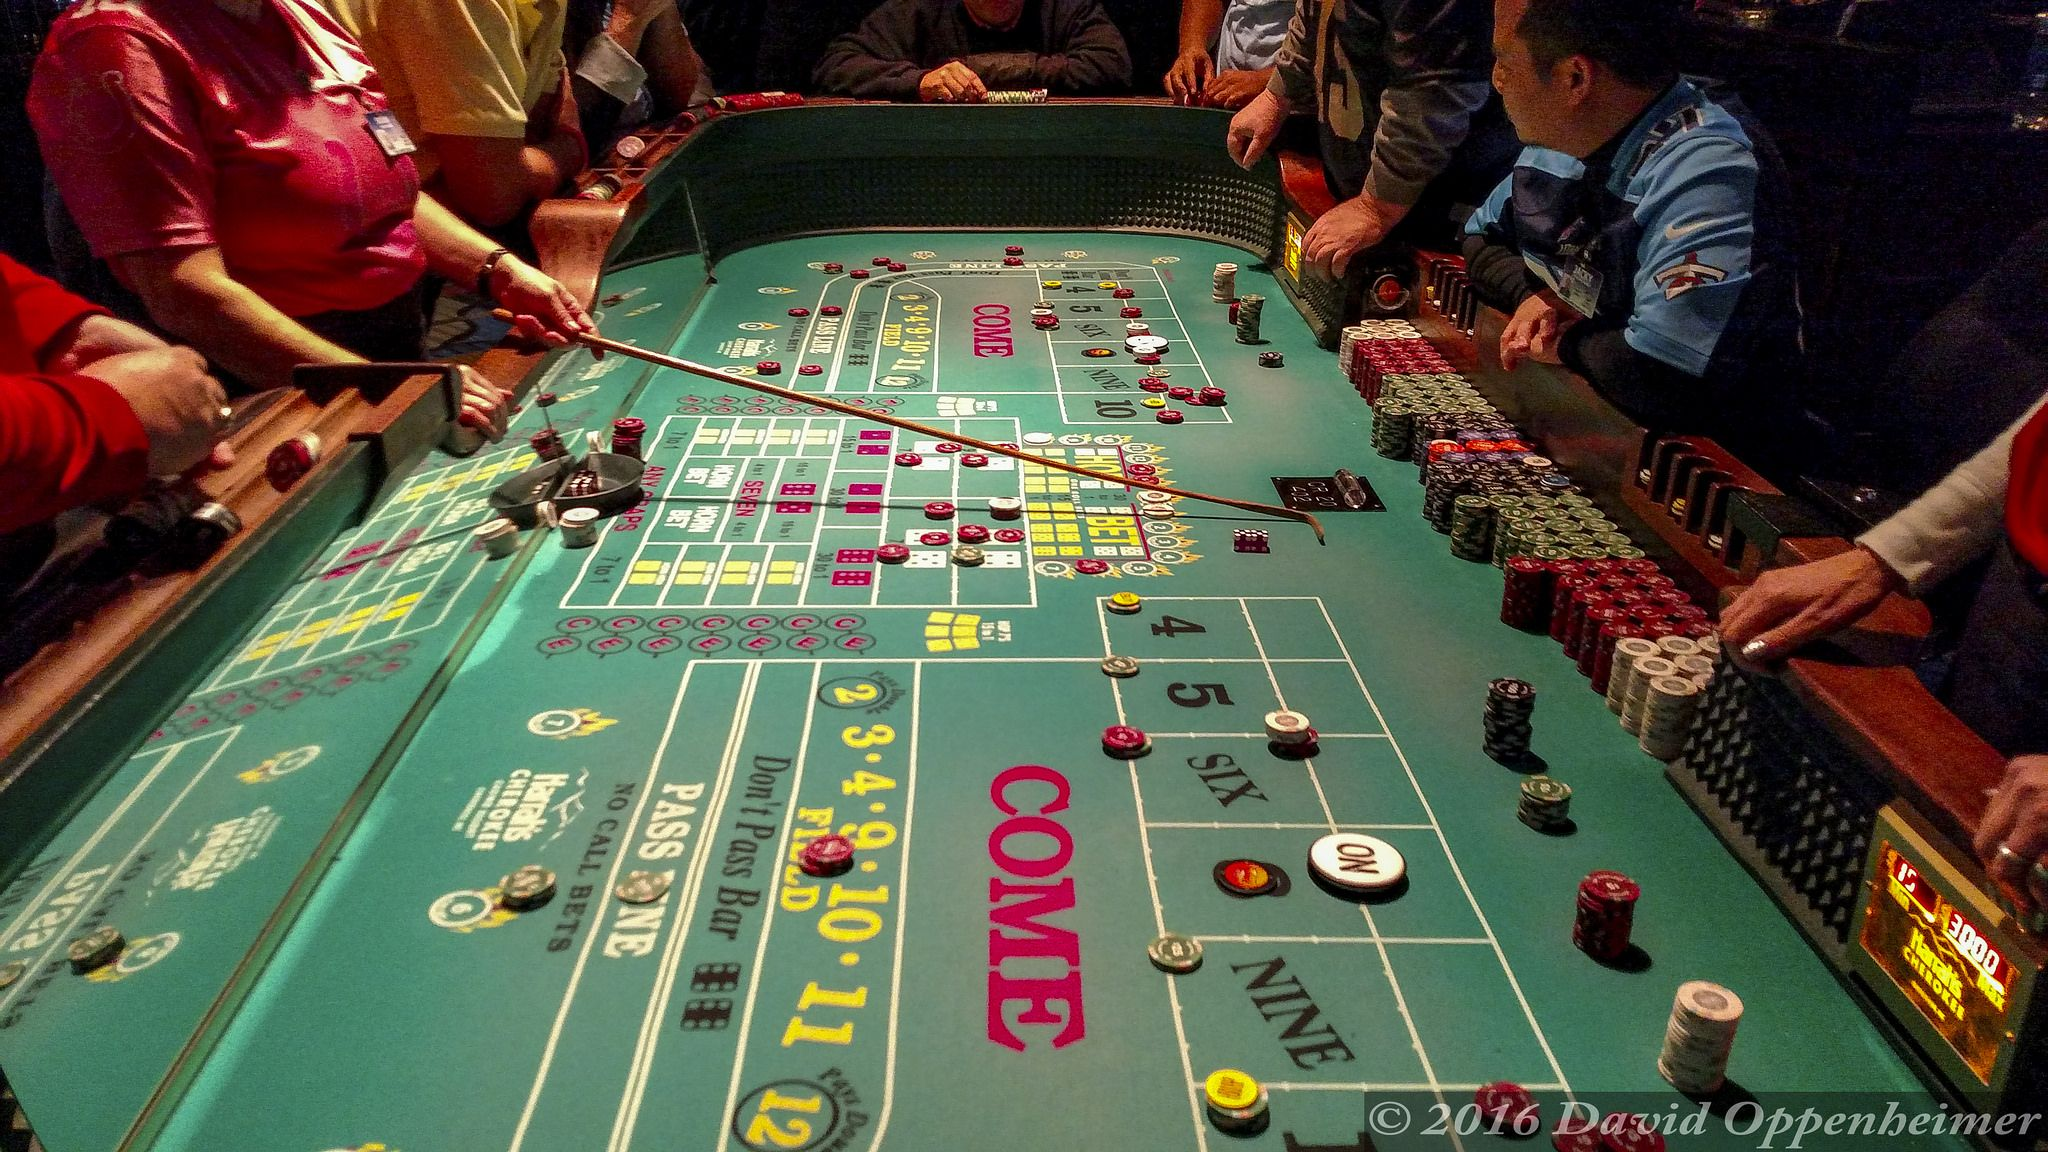 Casino saints row 2